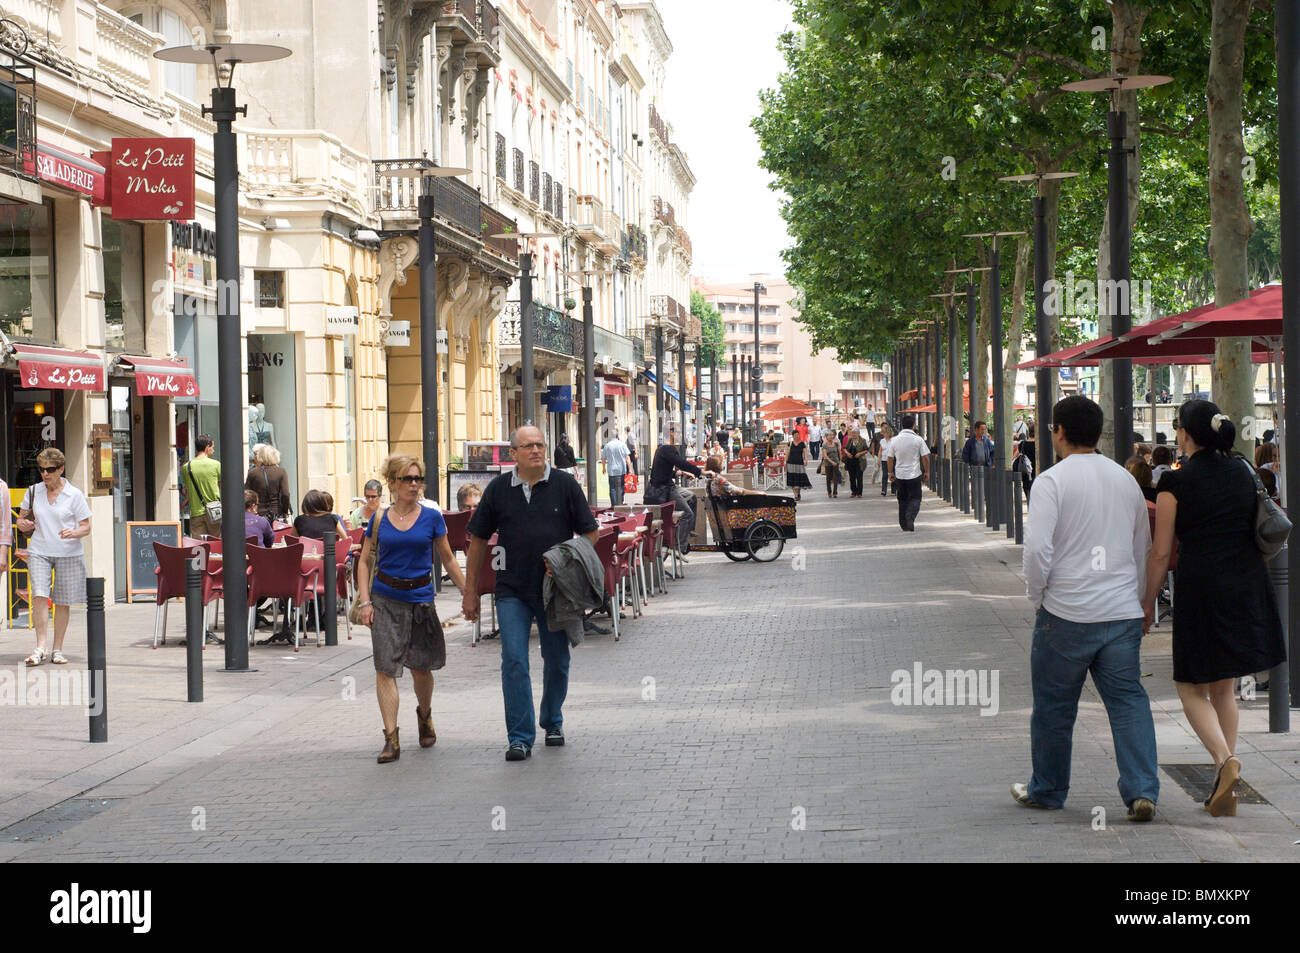 Scène de rue à Perpignan, Photo Stock